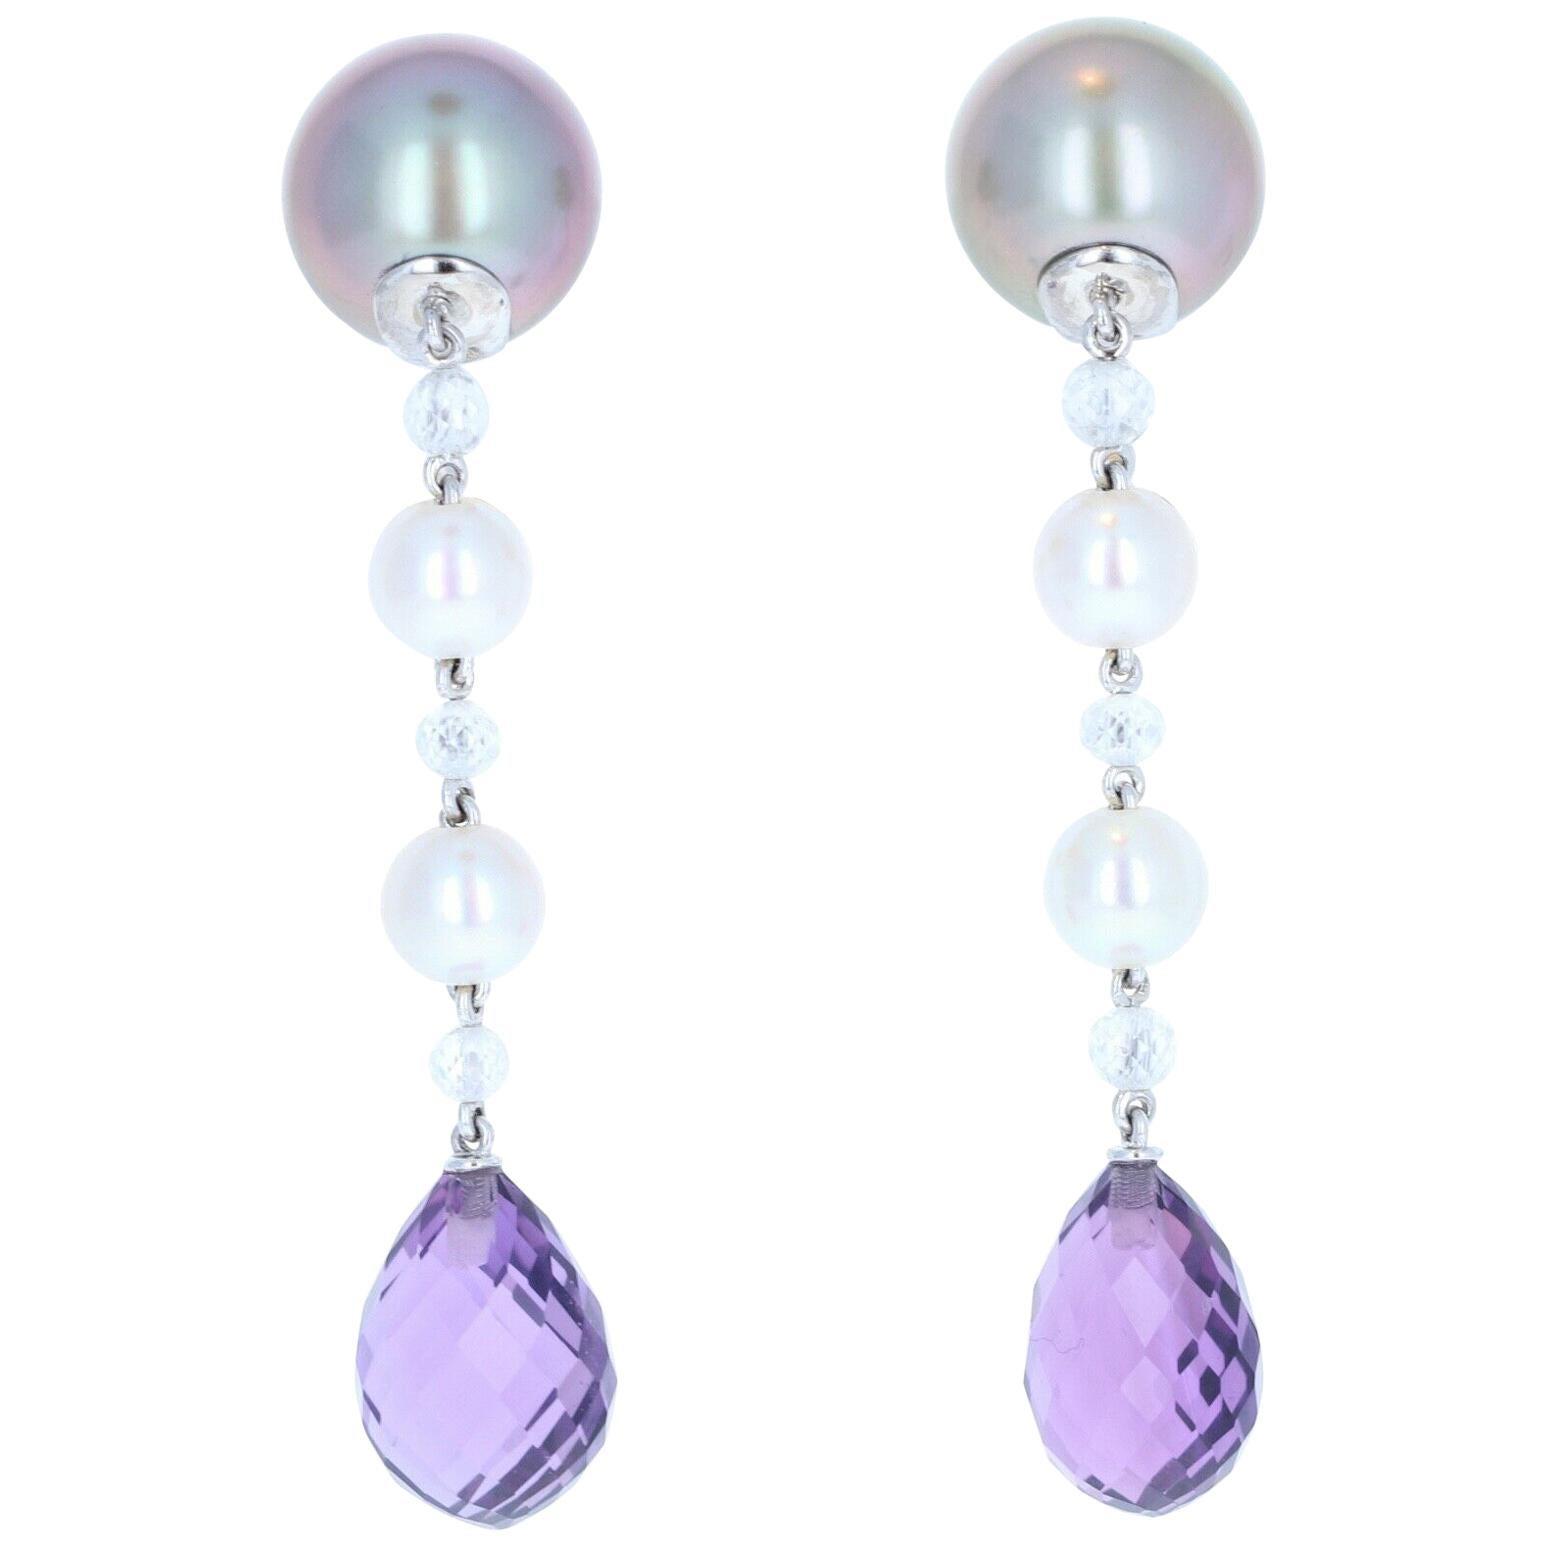 Chaumet 18K Gold, Pearl, Briolette Diamond and Amethyst Drop Earrings B & P